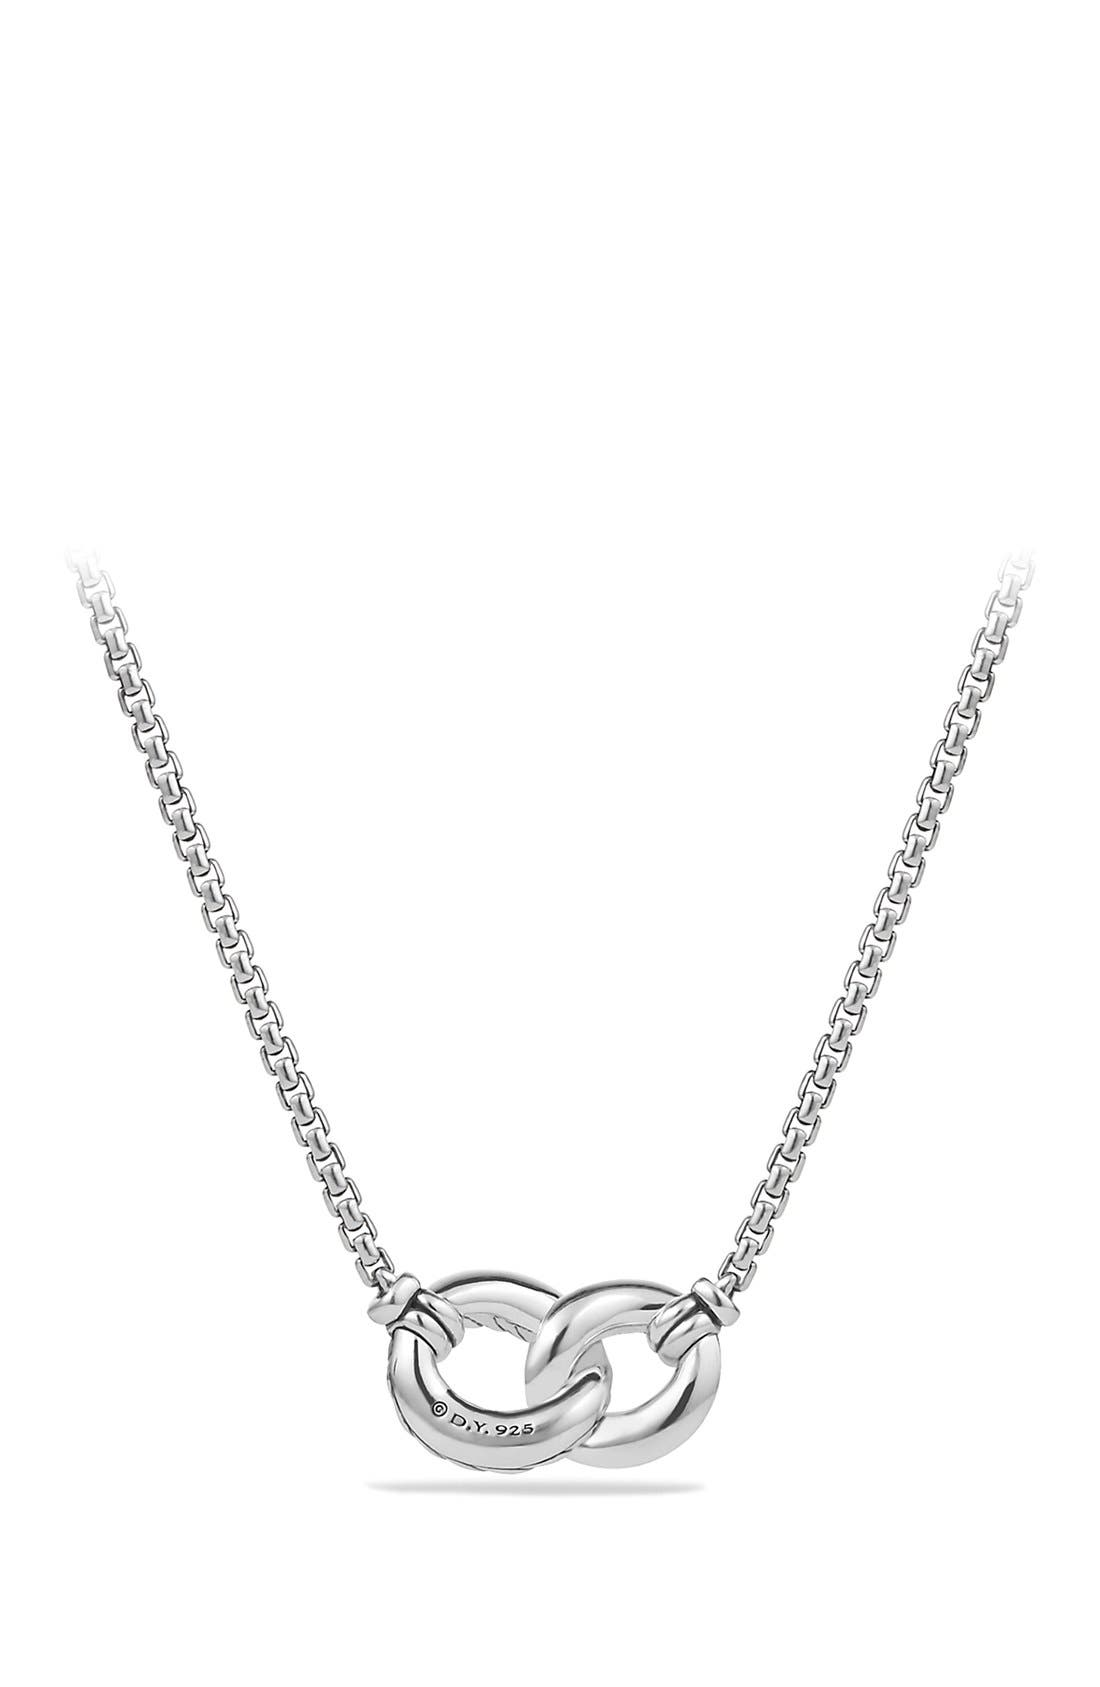 'Belmont' Necklace with Diamonds,                             Alternate thumbnail 3, color,                             DIAMOND